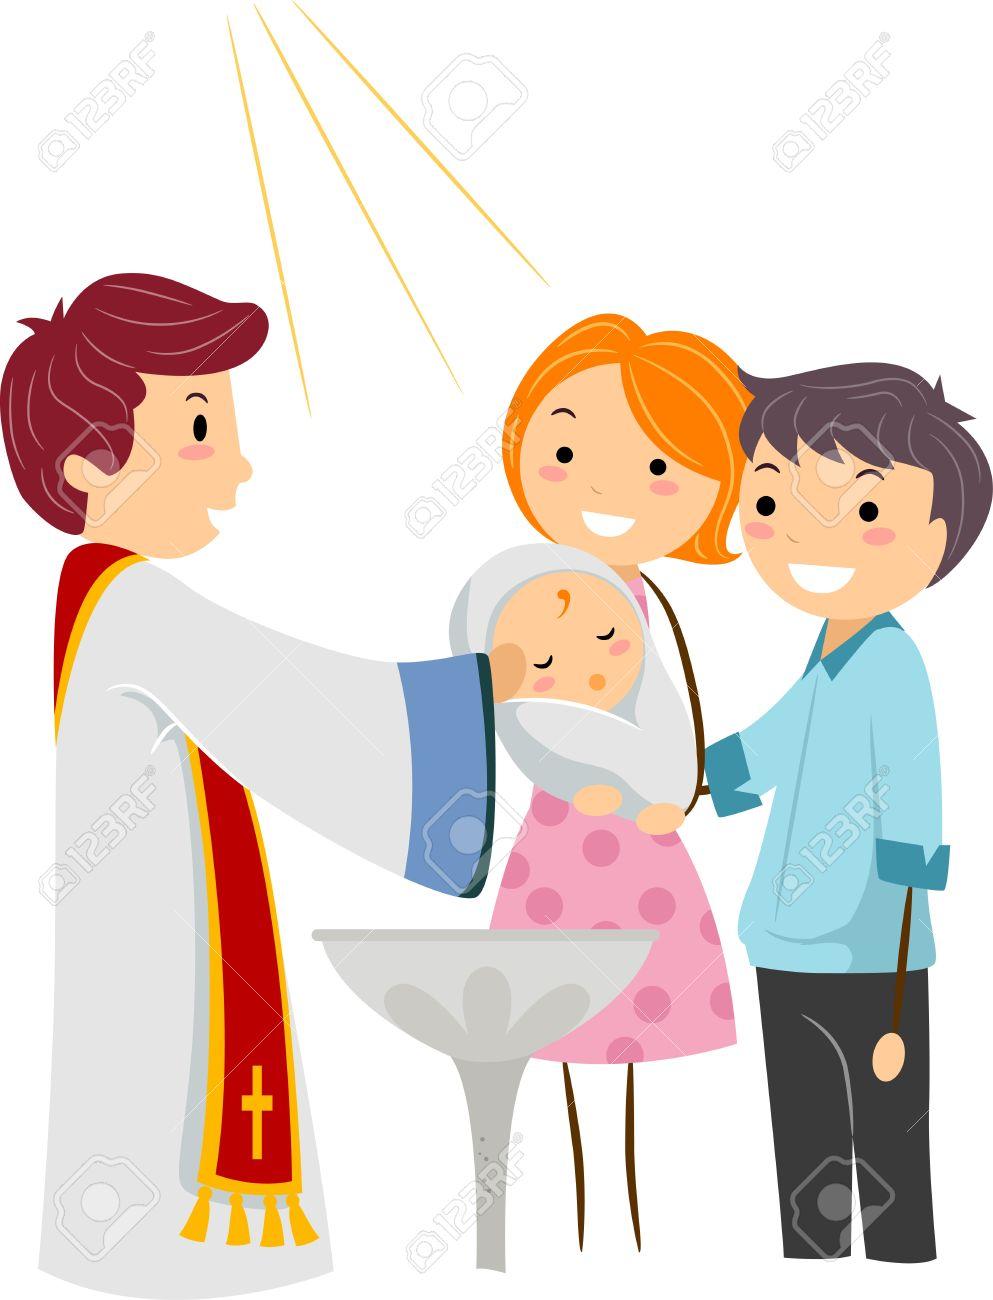 medium resolution of illustration illustration of a priest baptizing a child